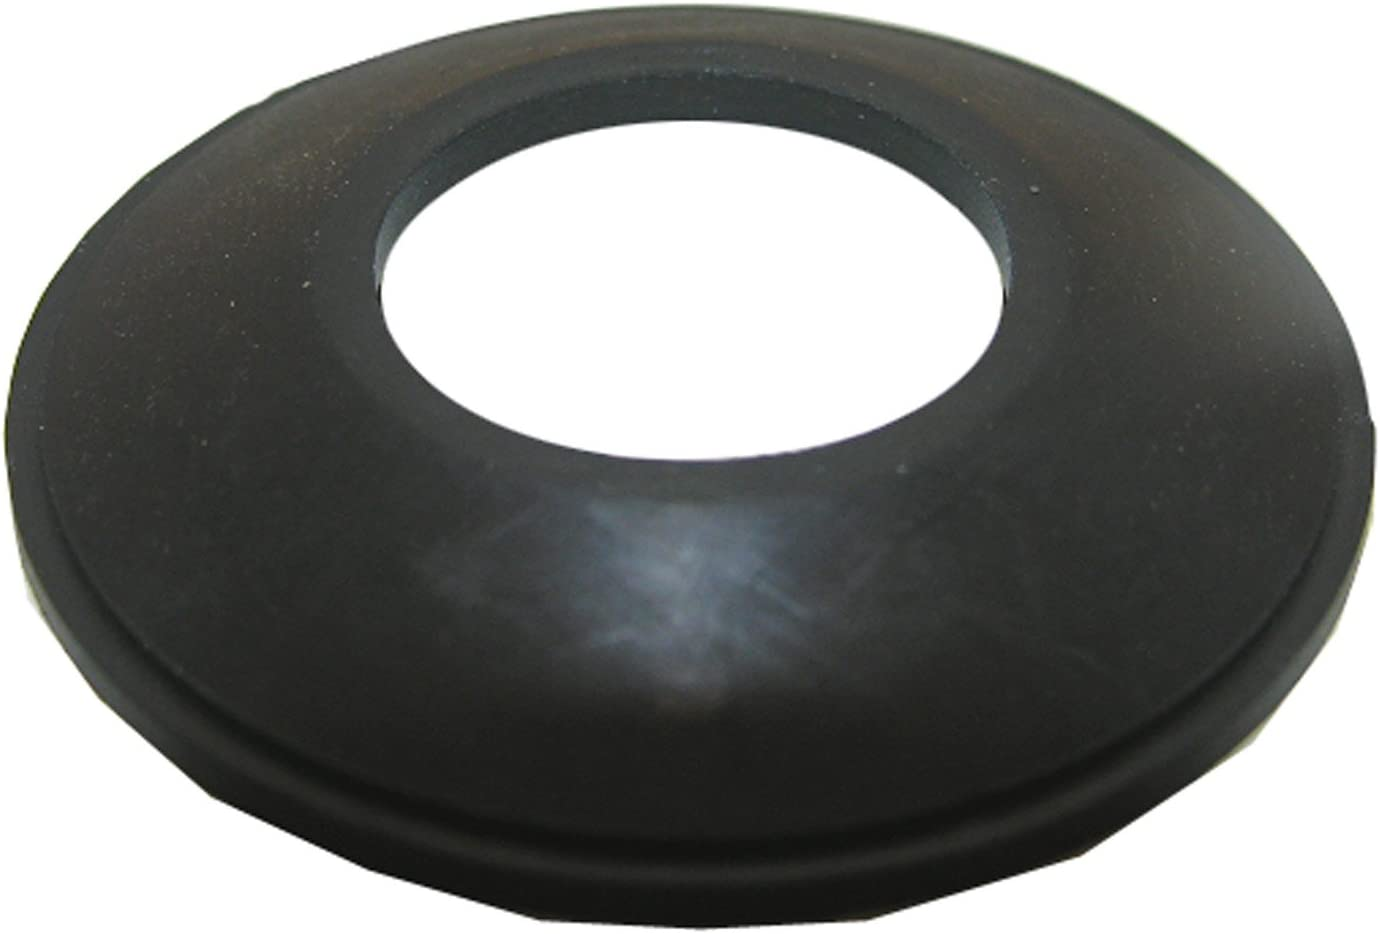 LASCO 02-3033 Heavy Duty Style Bathtub Rubber Gasket for Tub Drain Shoe